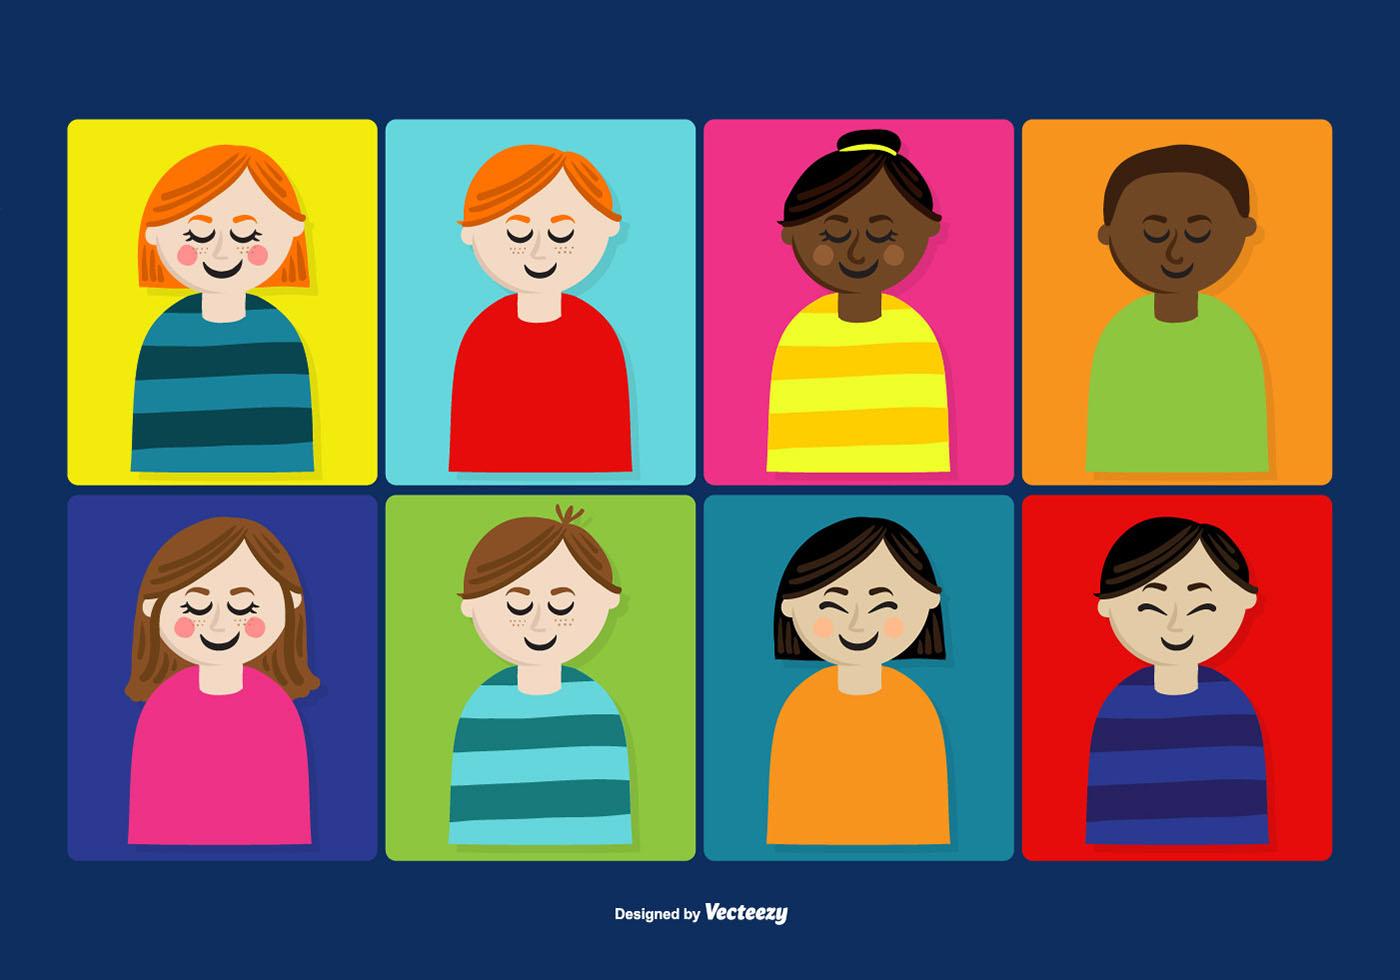 Cute People S Faces Vectors Download Free Vector Art